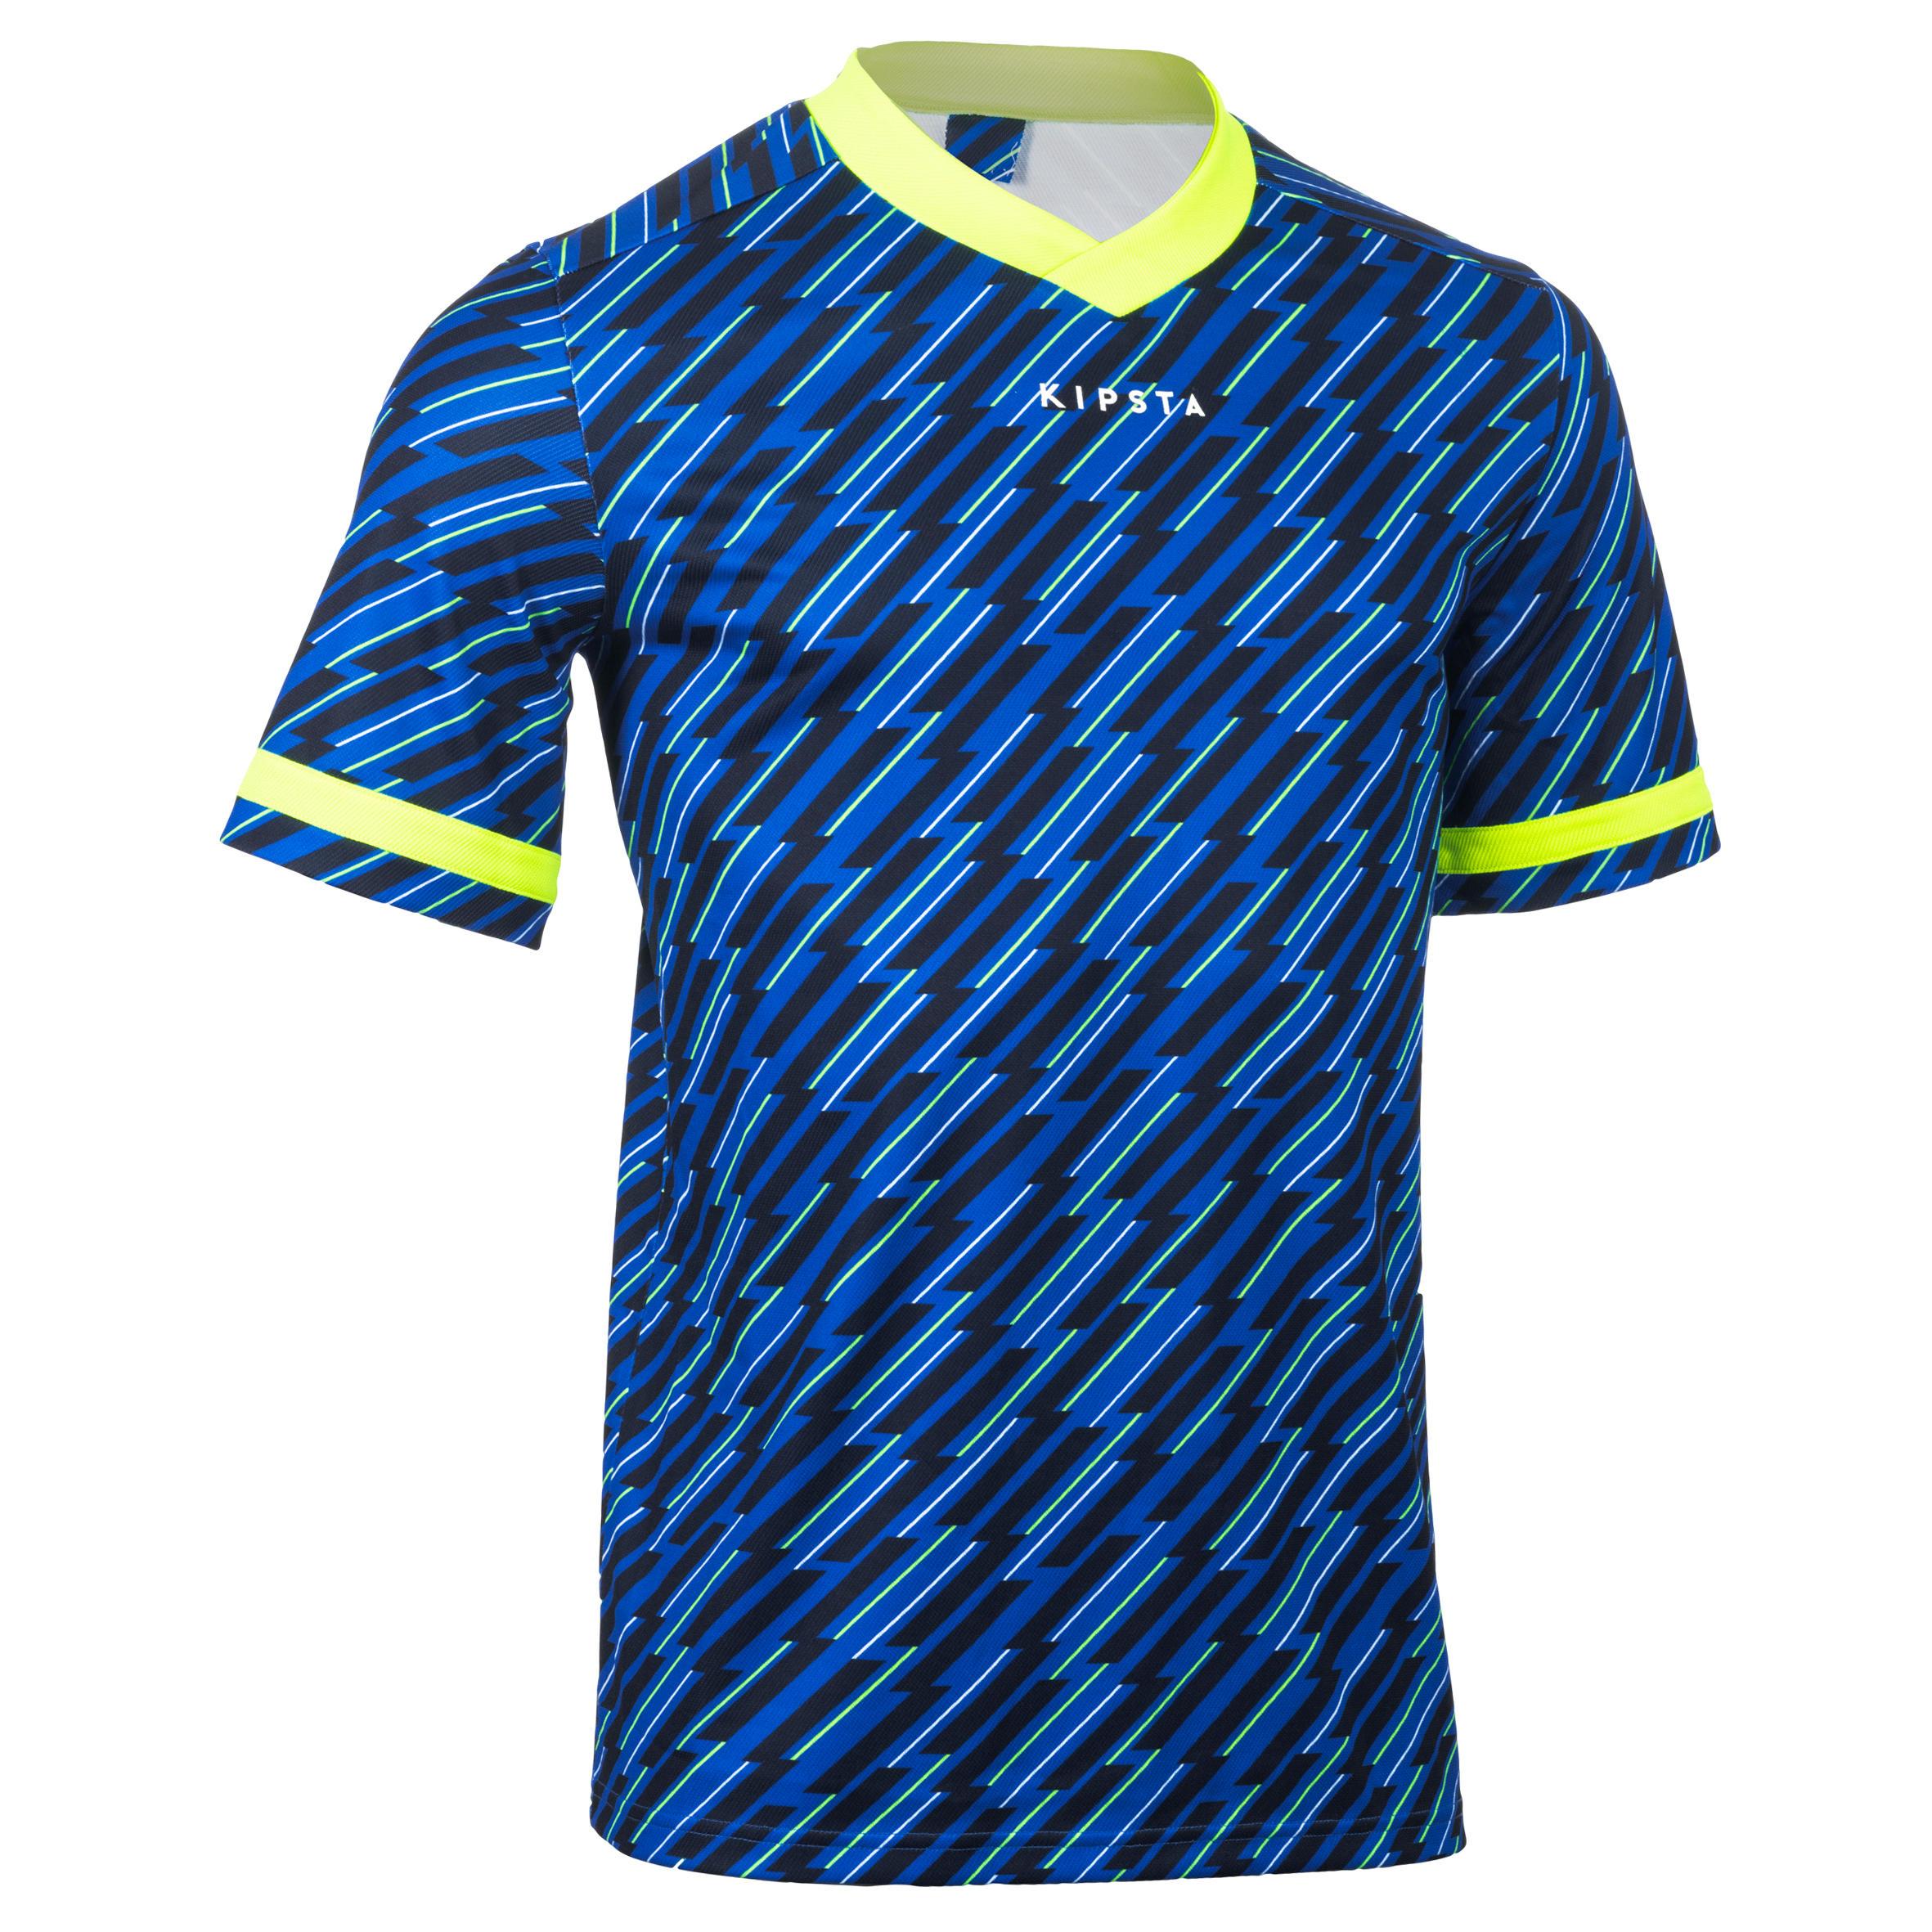 Offload Rugbyshirt voor volwassenen R100 blauw